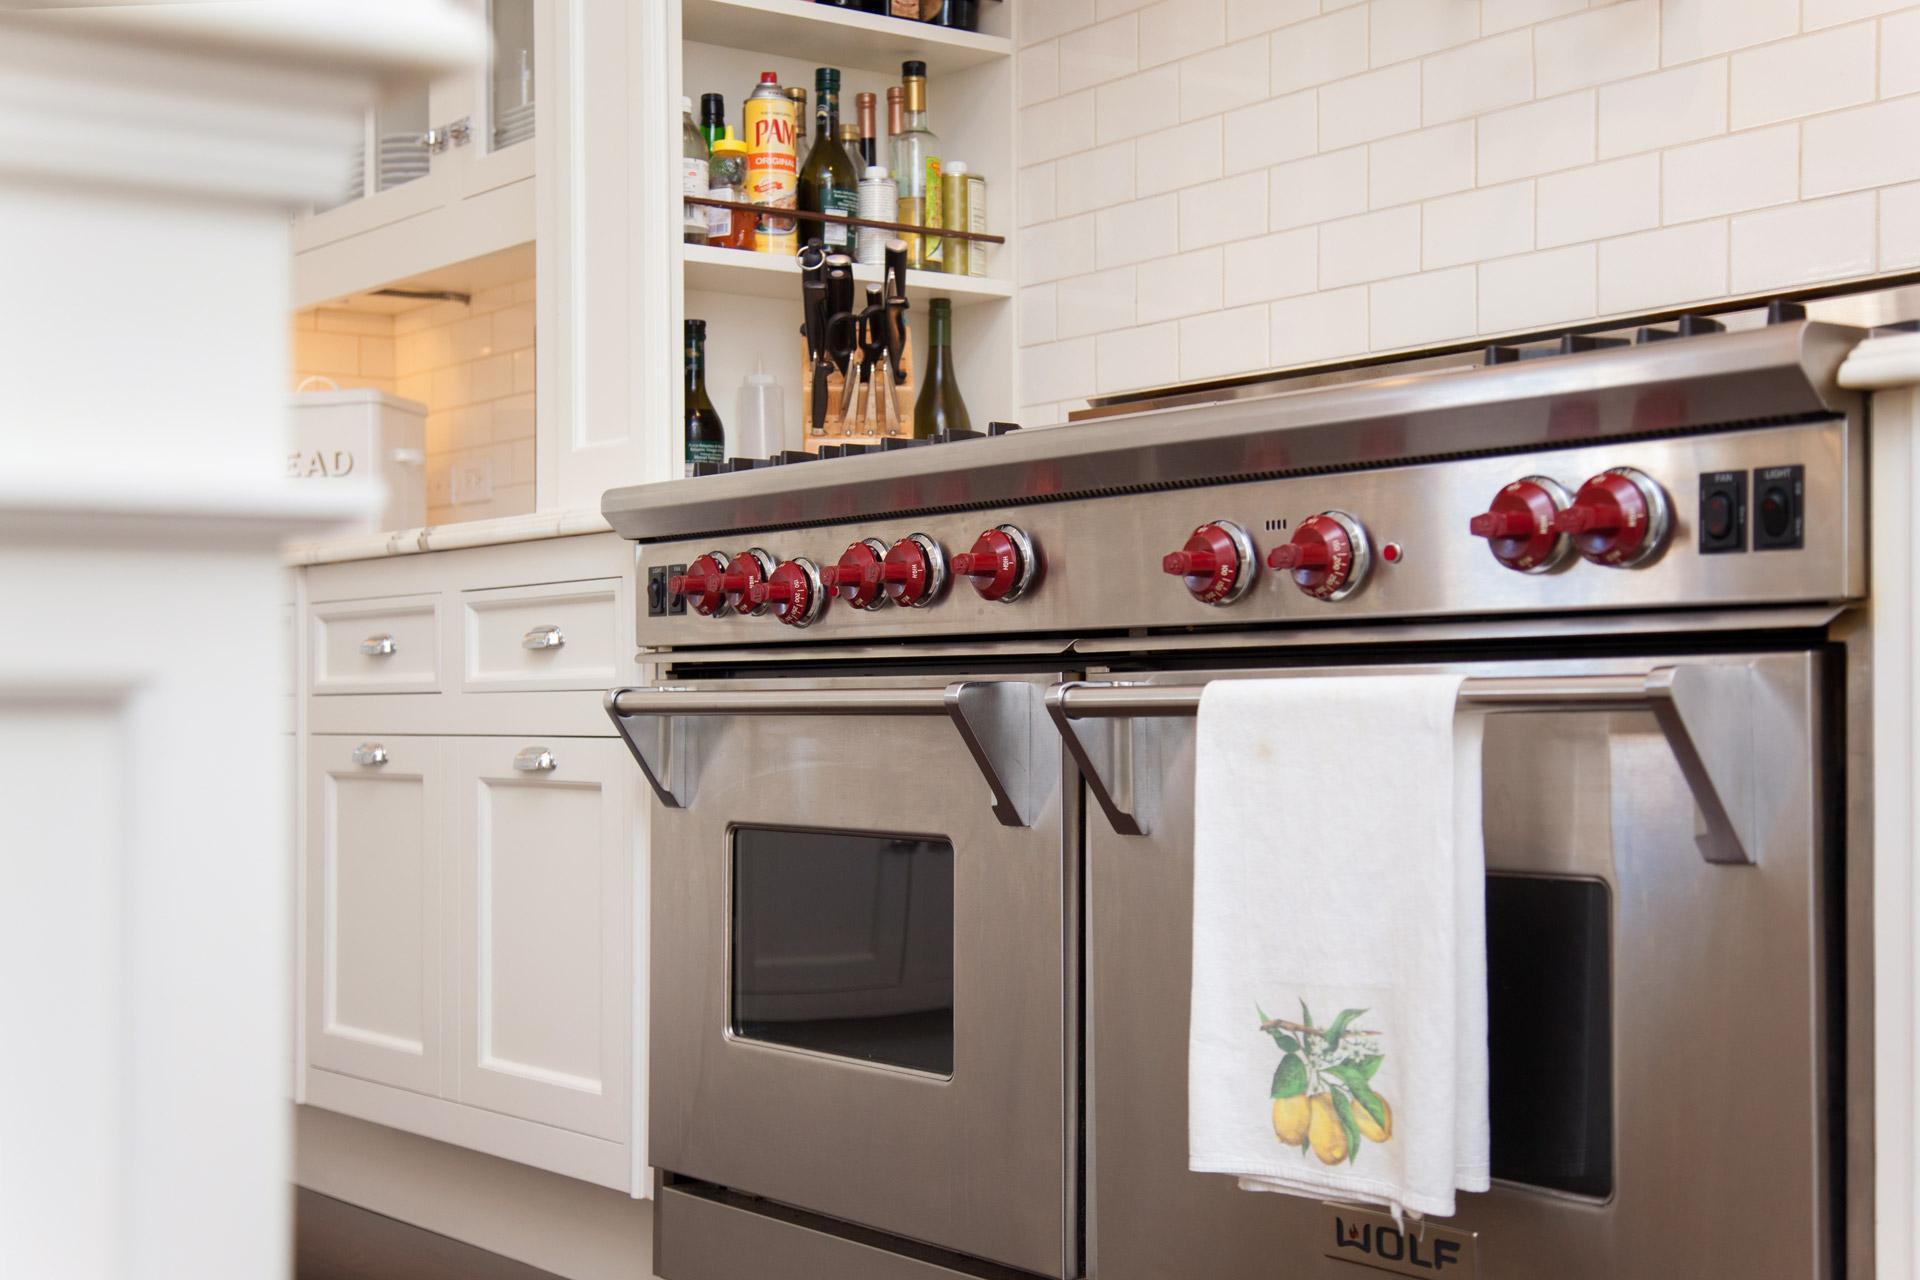 Stainless steel oven range stove